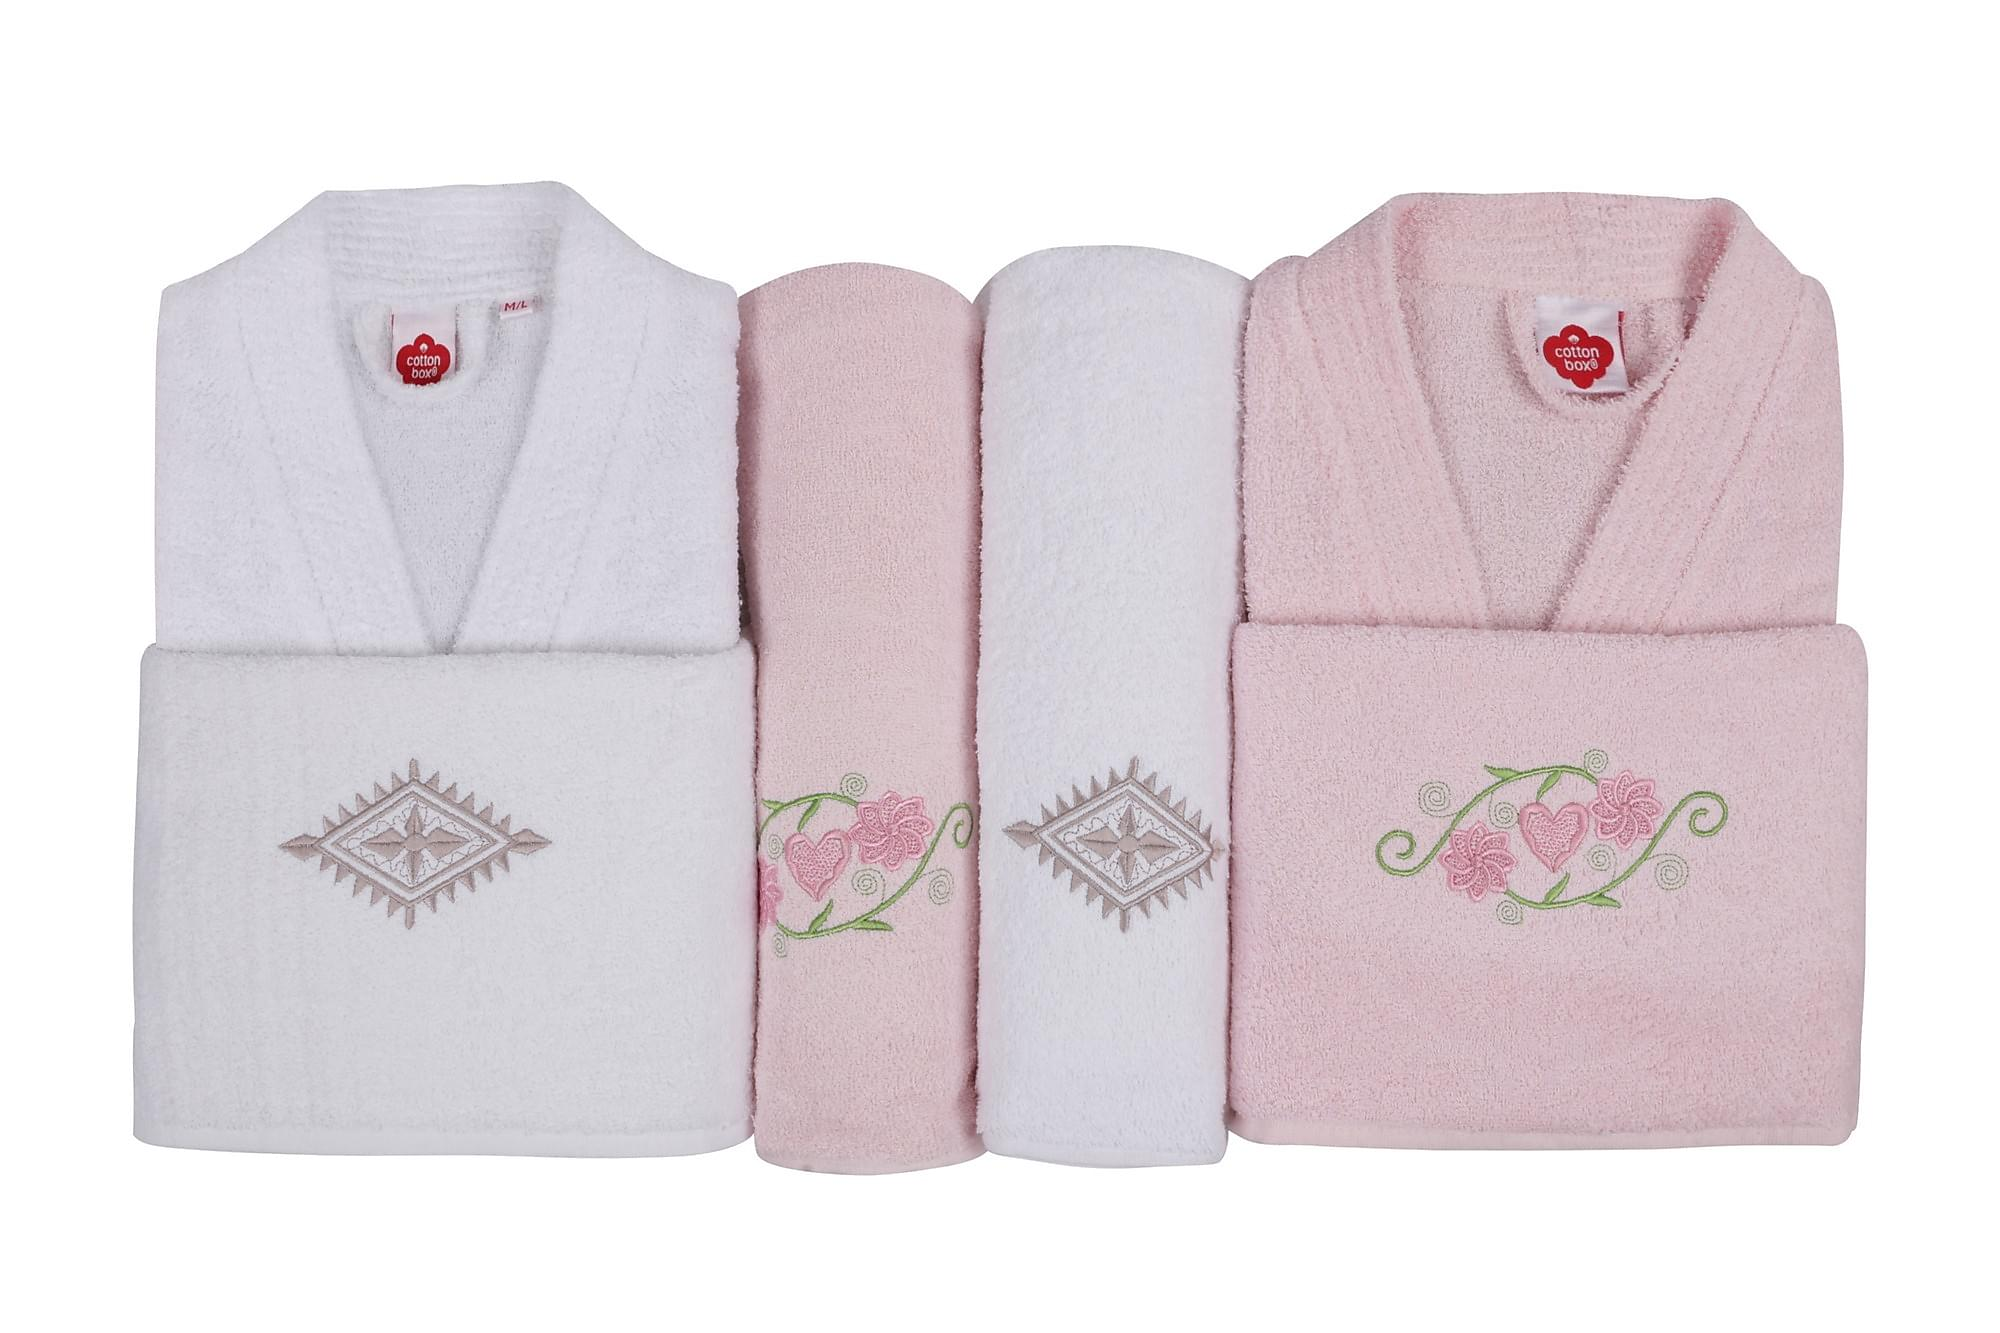 COTTON BOX Handduksset Familj Set om 4 Rosa/Vit